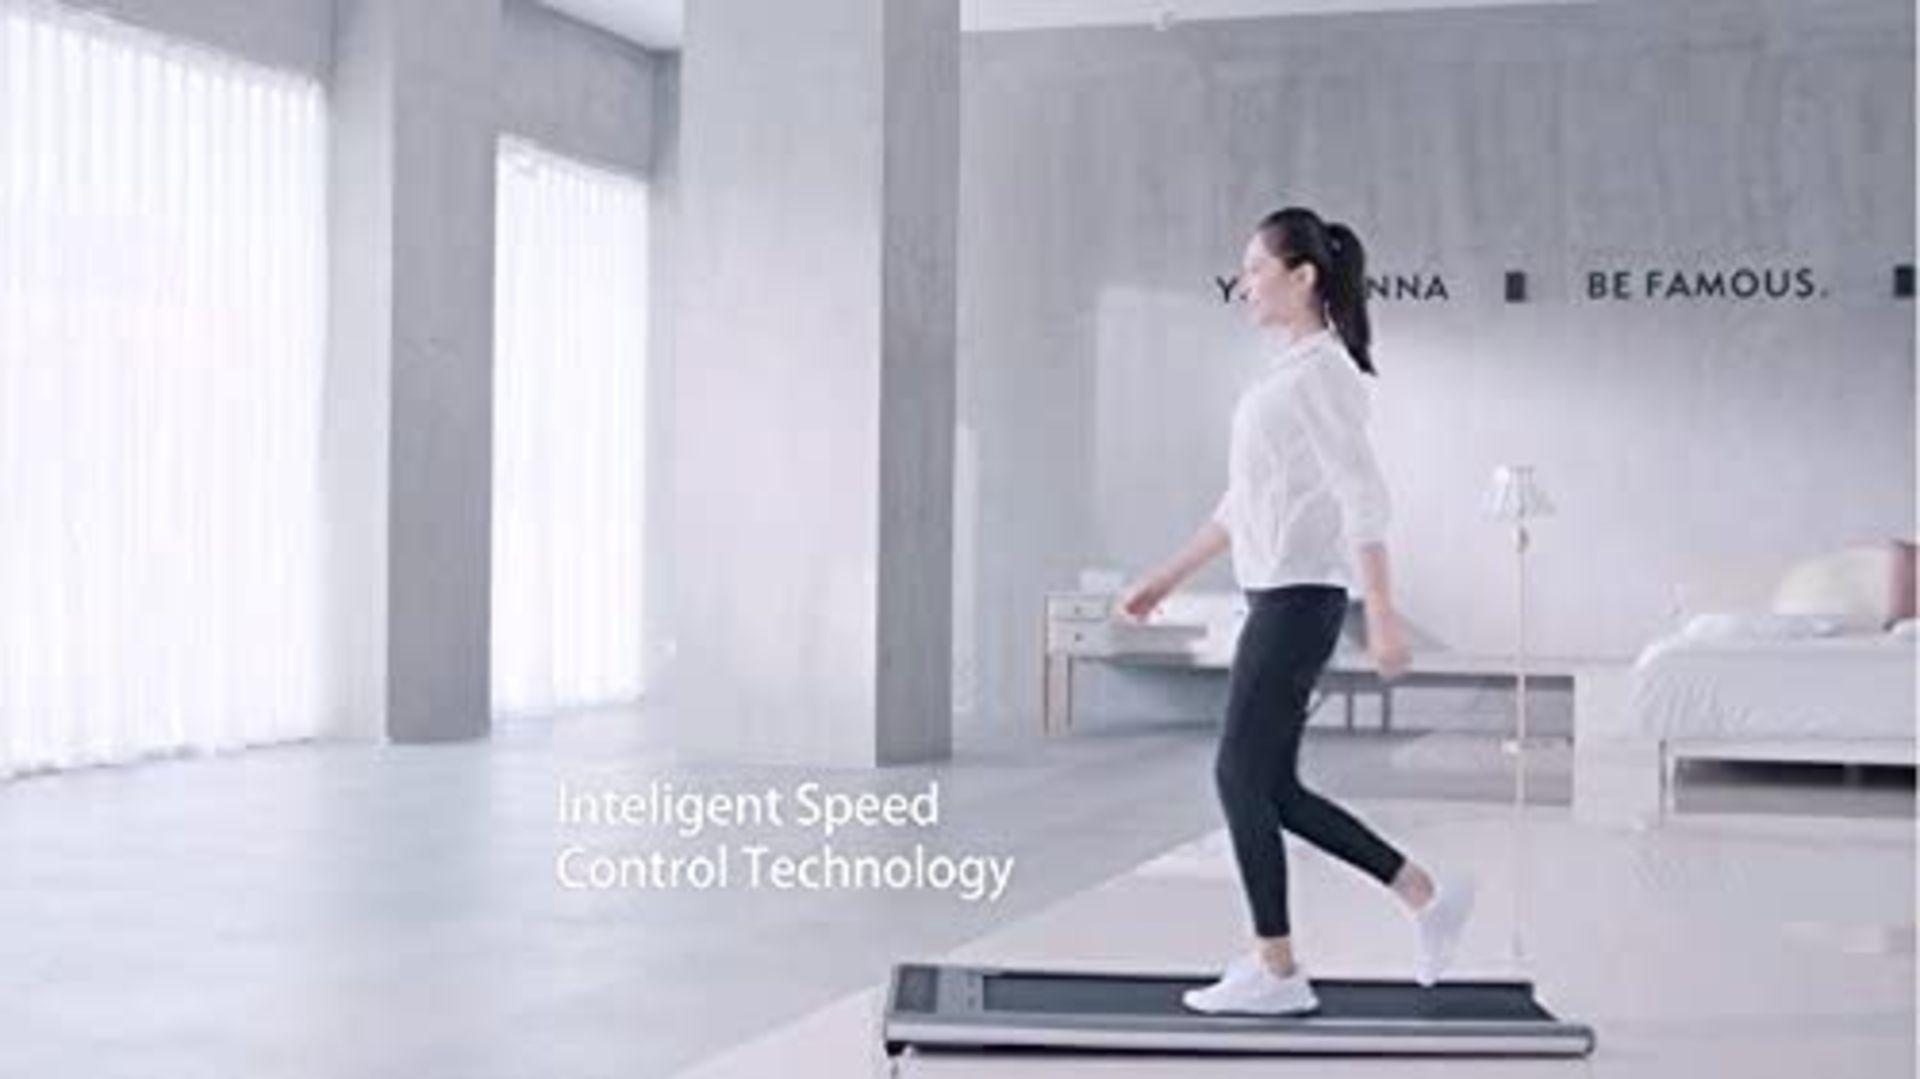 1 x Slim Tread Ultra Thin Smart Treadmill Running / Walking Machine - Lightweight With Folding - Image 11 of 23